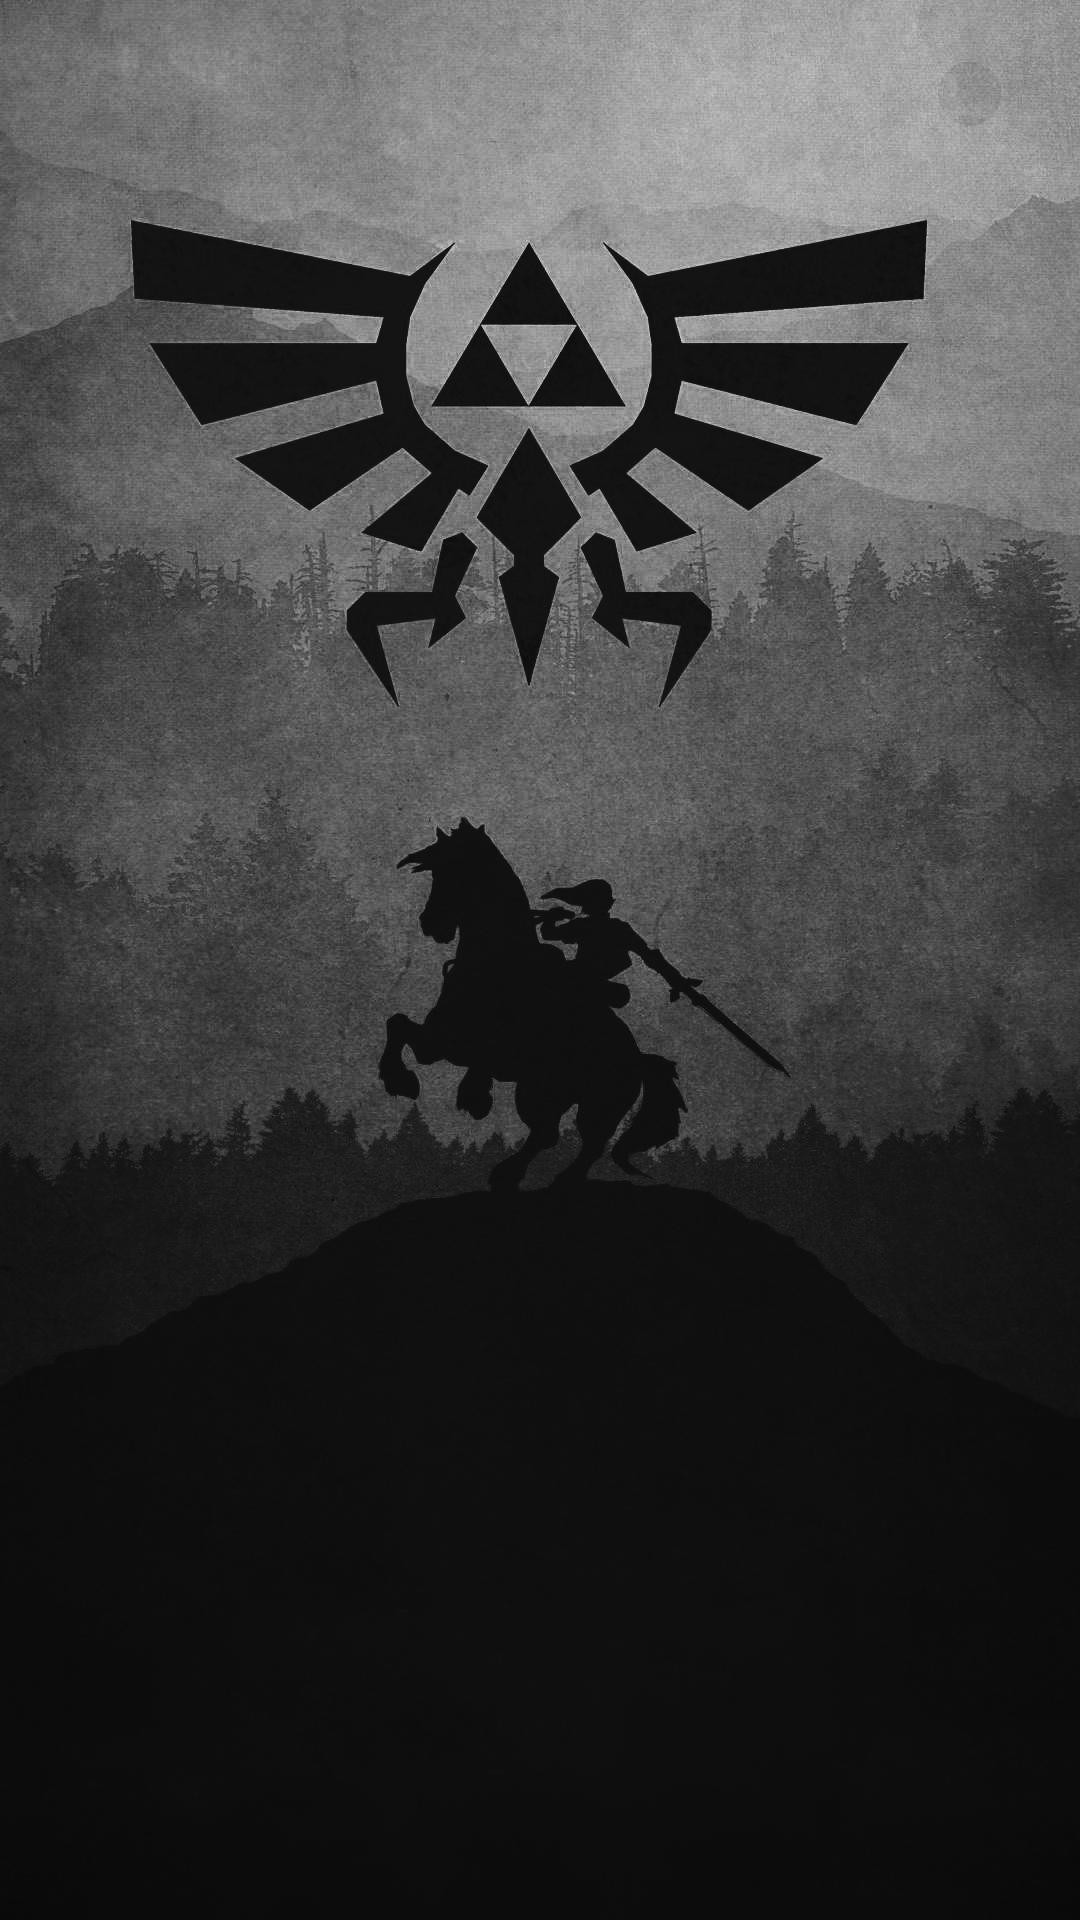 Zelda Wallpaper and Screensavers (65+ images)